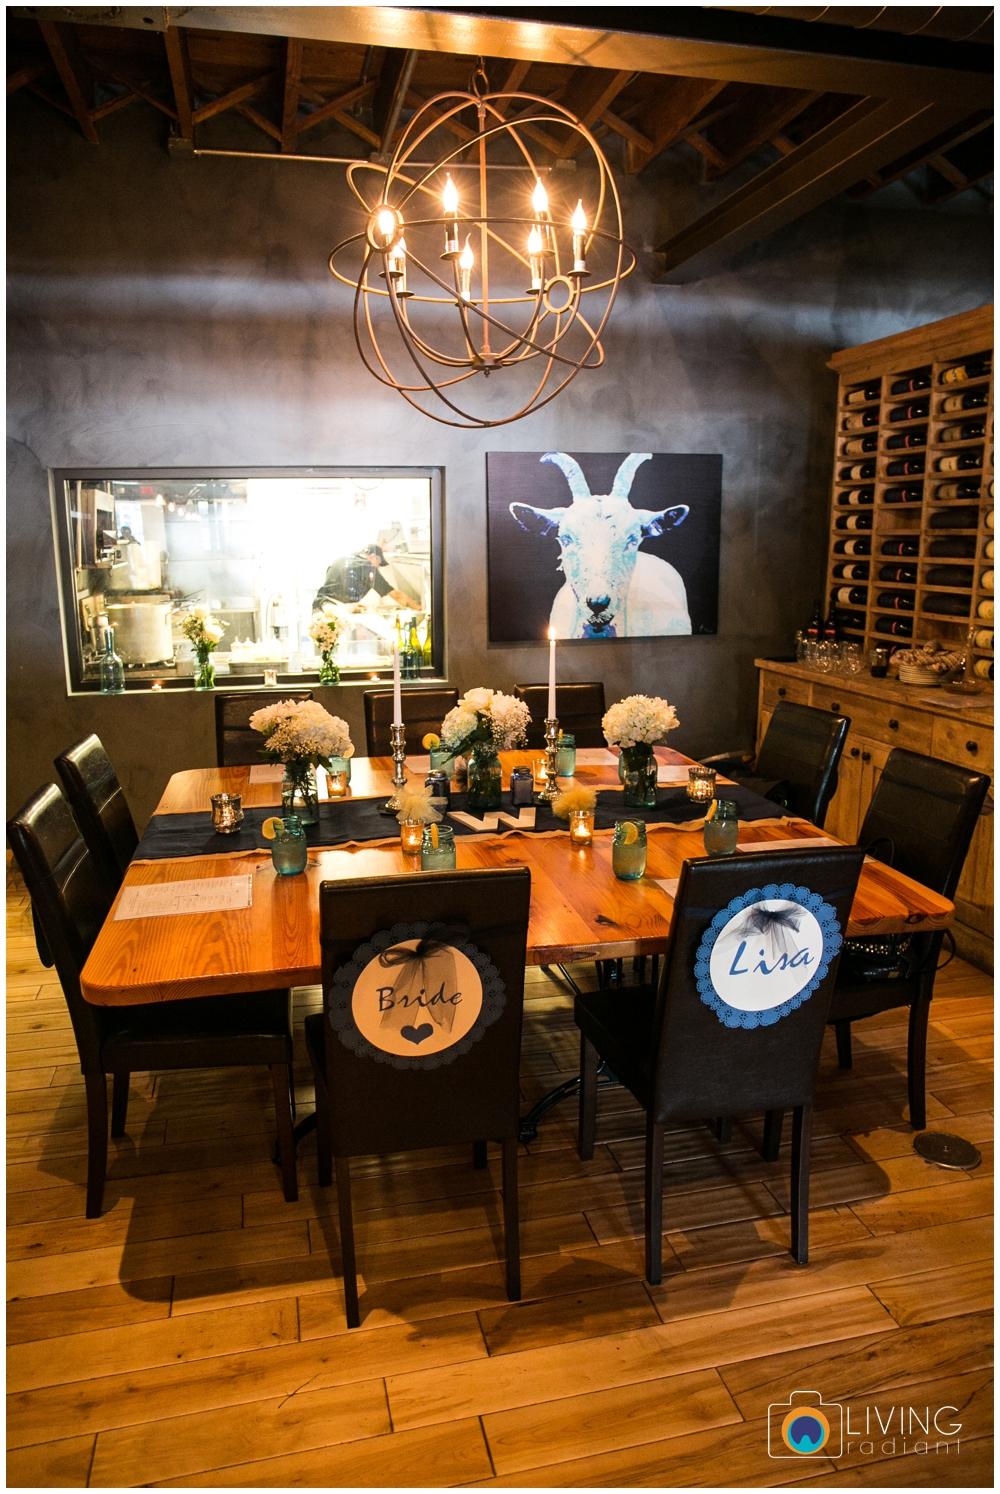 krissys-bridesmaid-luncheon-the-blue-goat-richmond-virginia-living-radiant-photography_0003.jpg